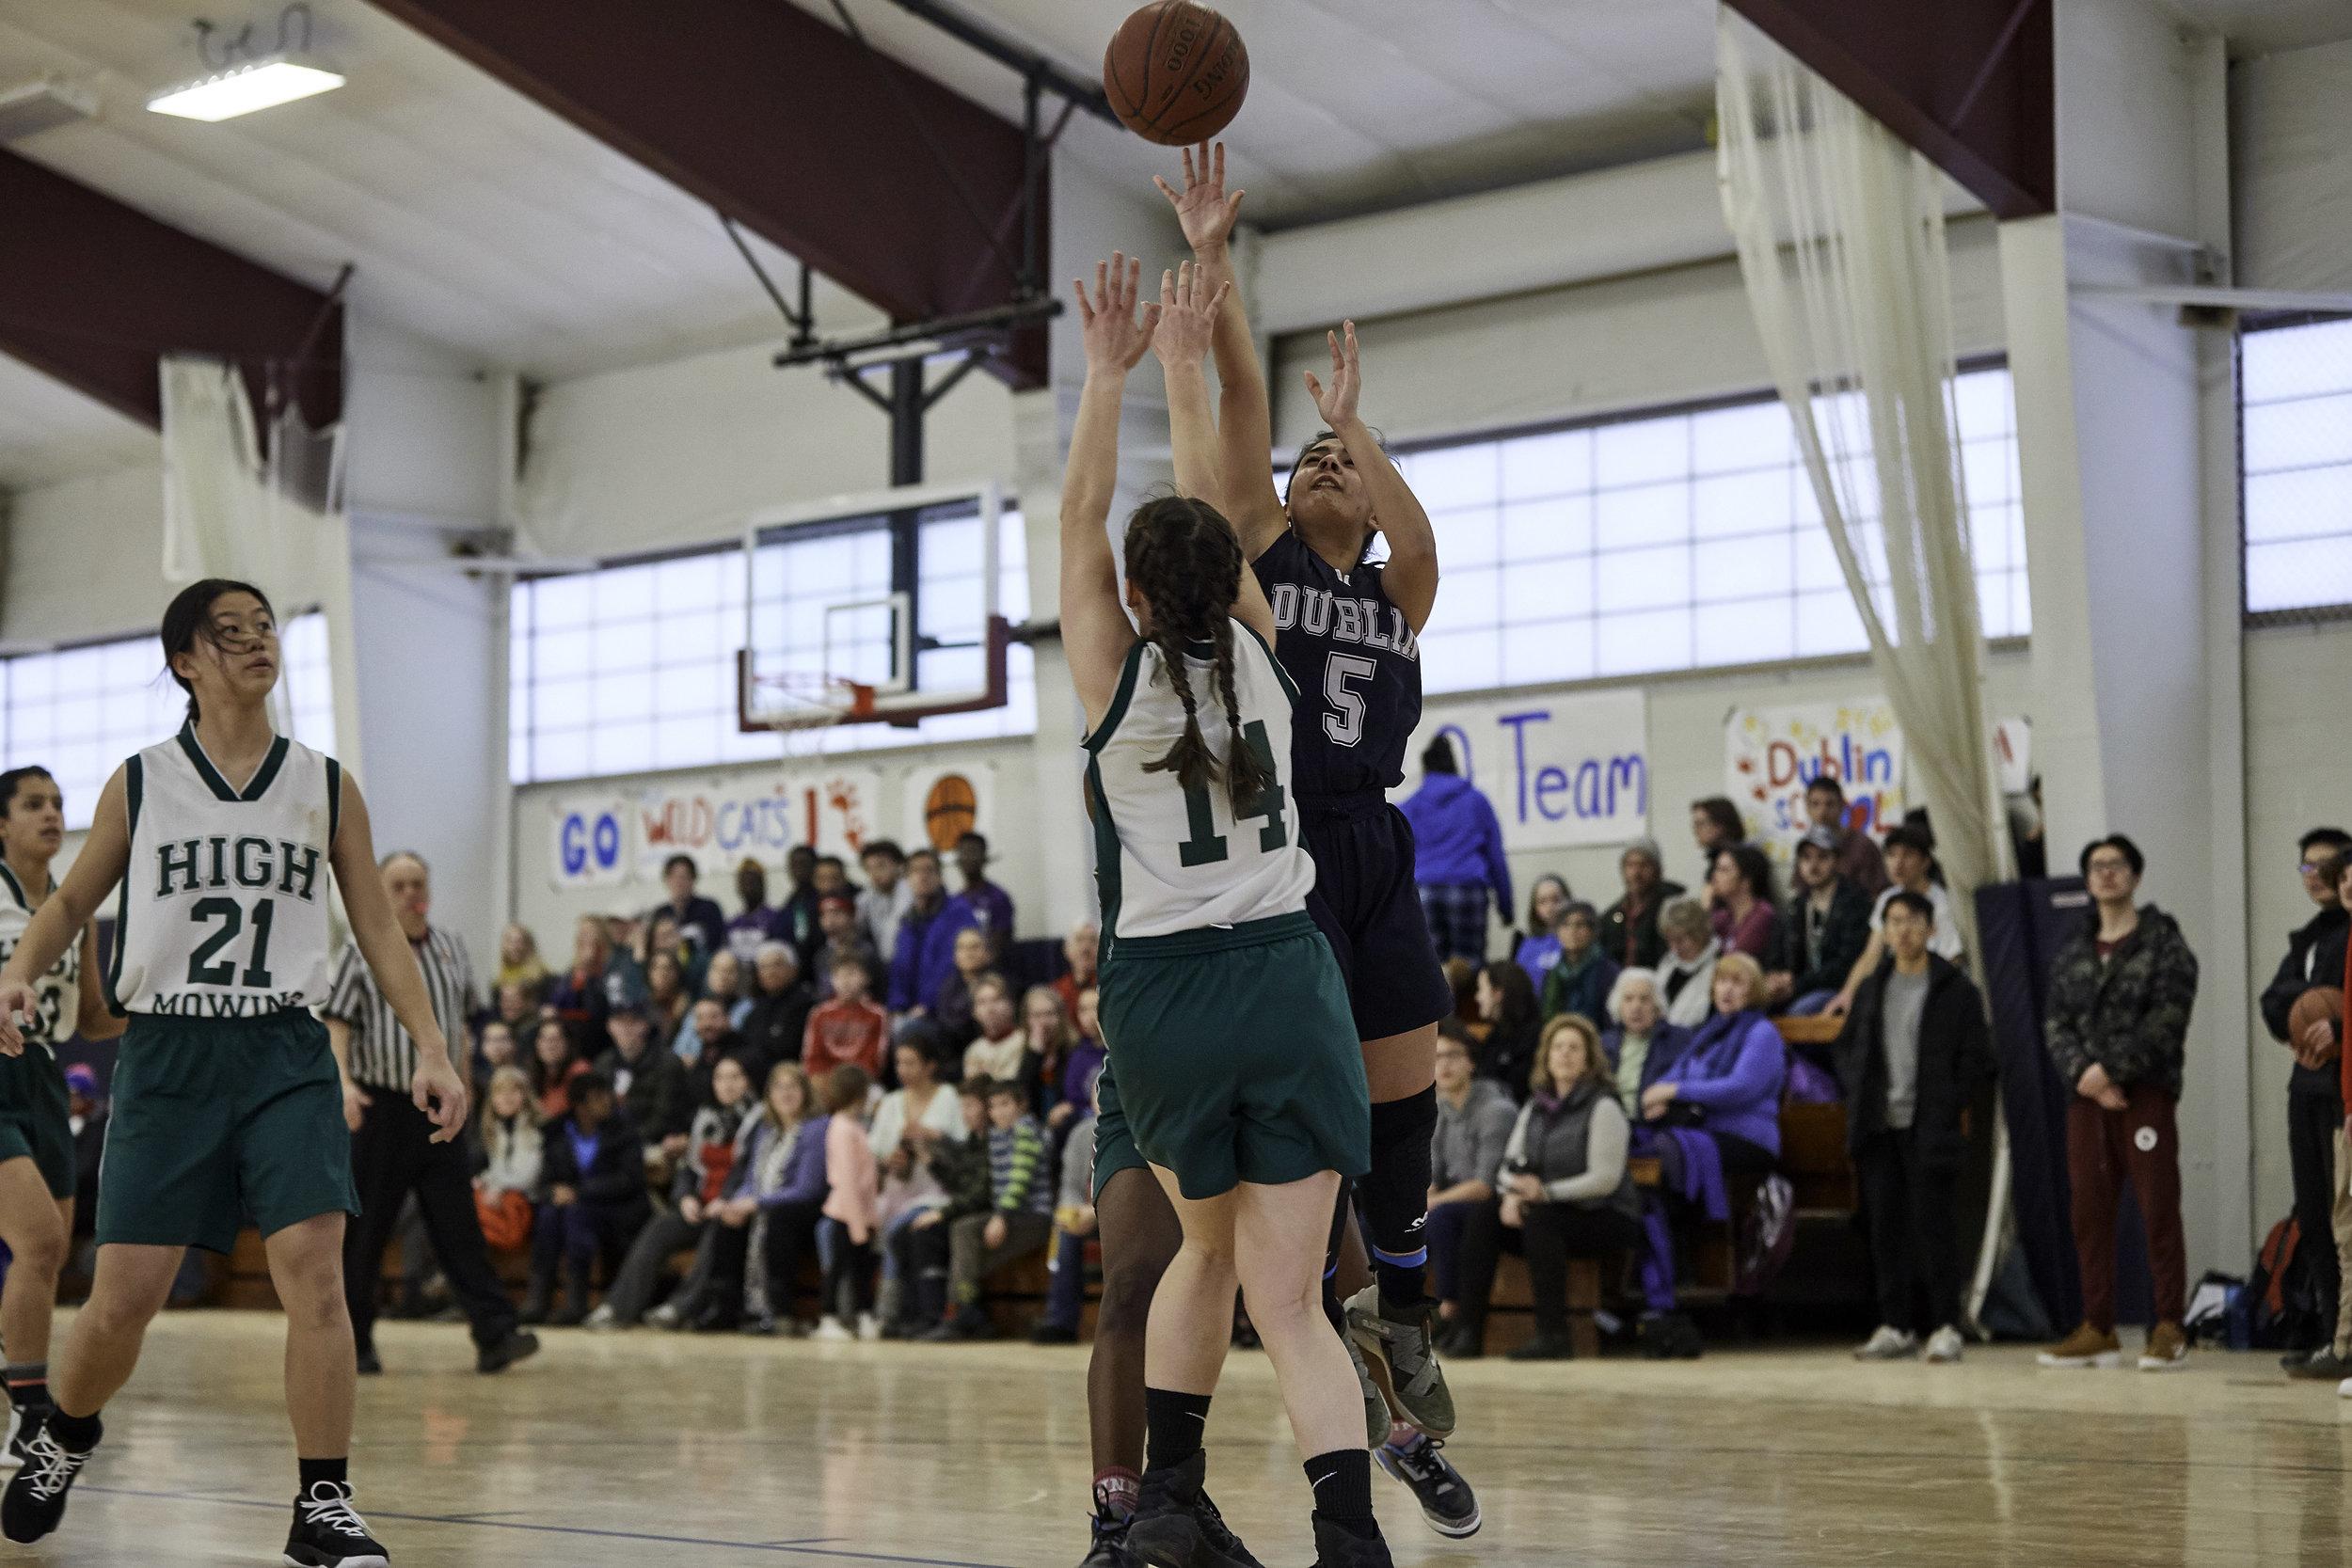 Basketball vs High Mowing School, February 2, 2019 - 166284.jpg